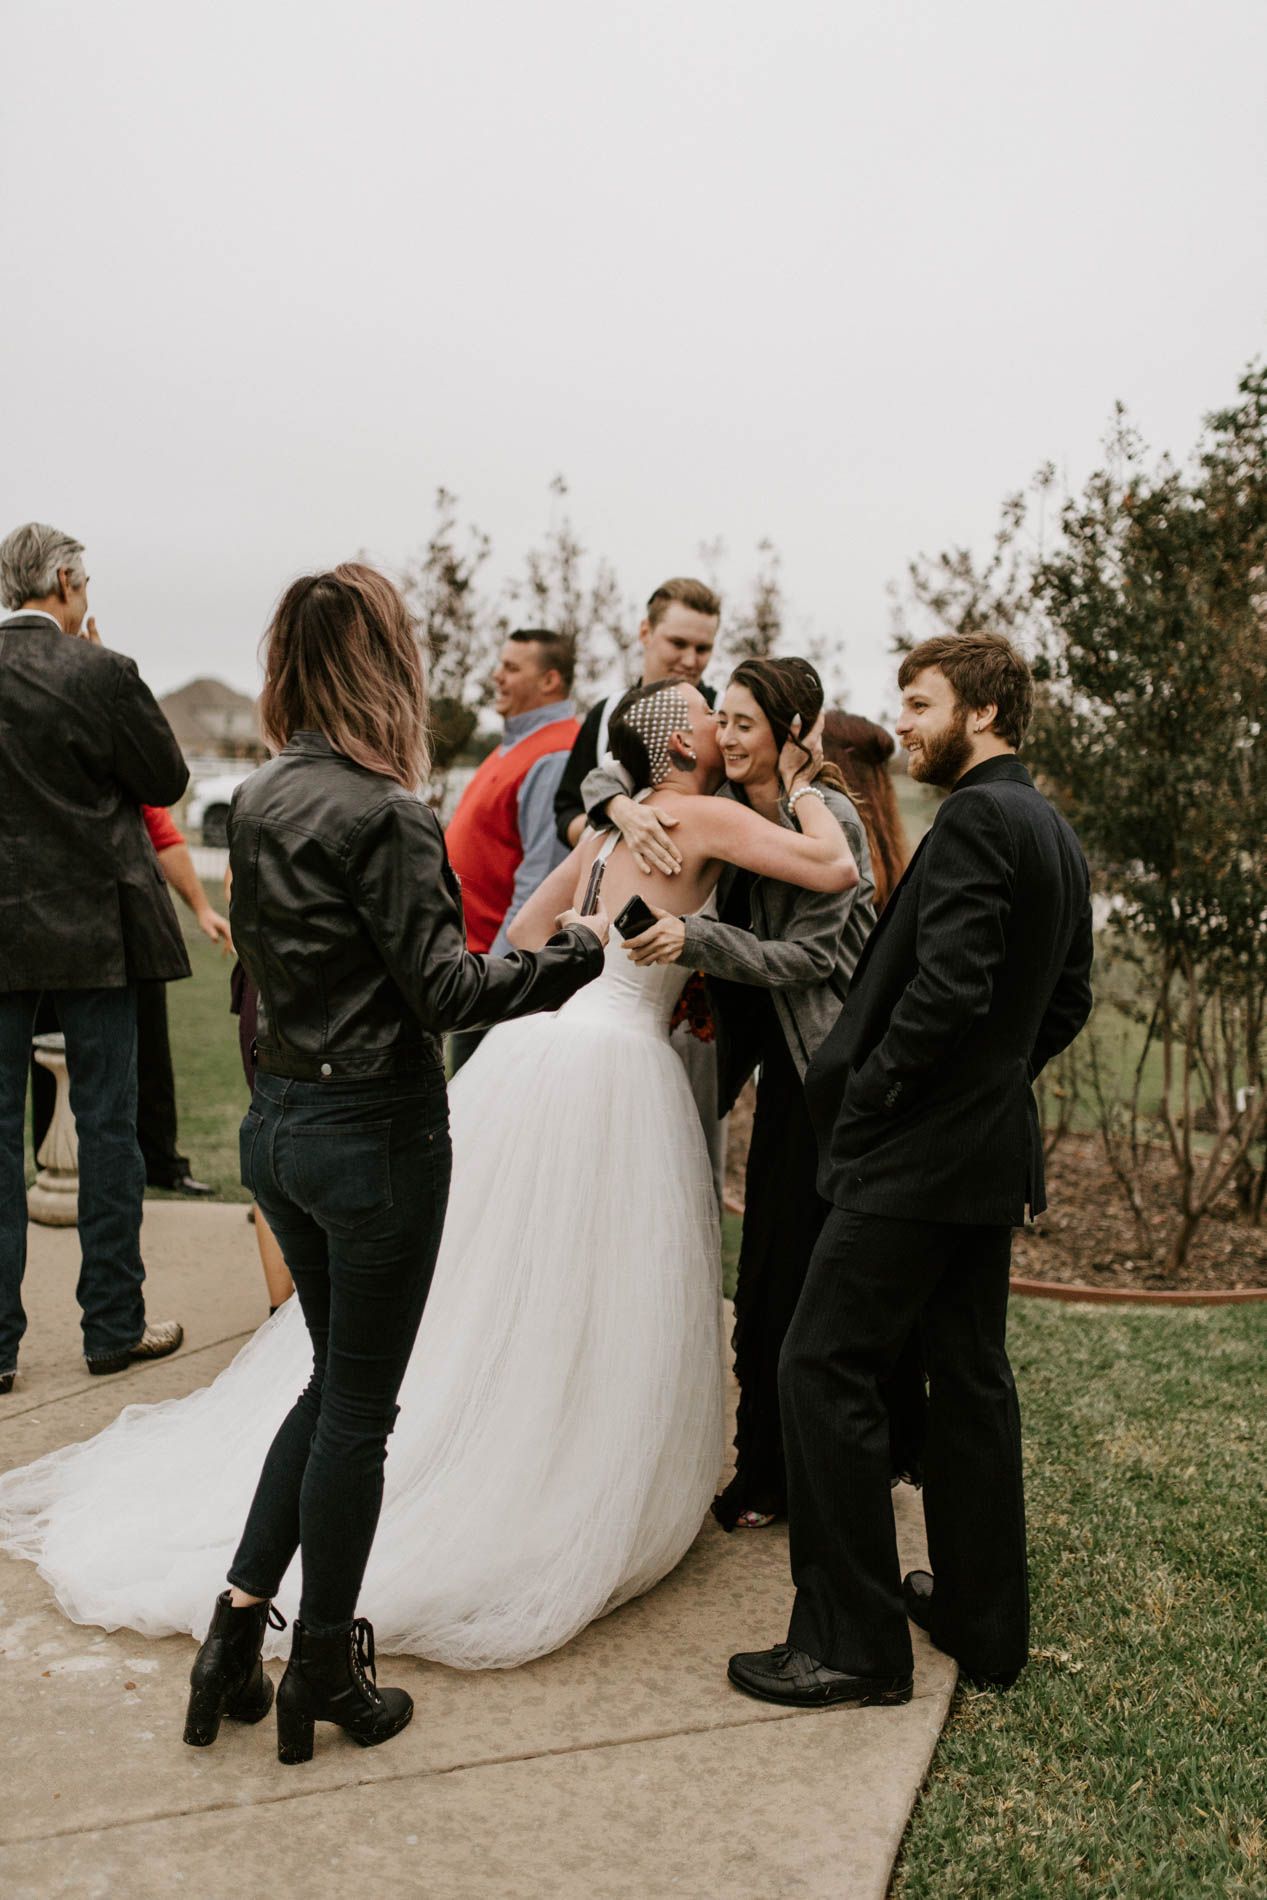 bride greeting guests at wedding reception